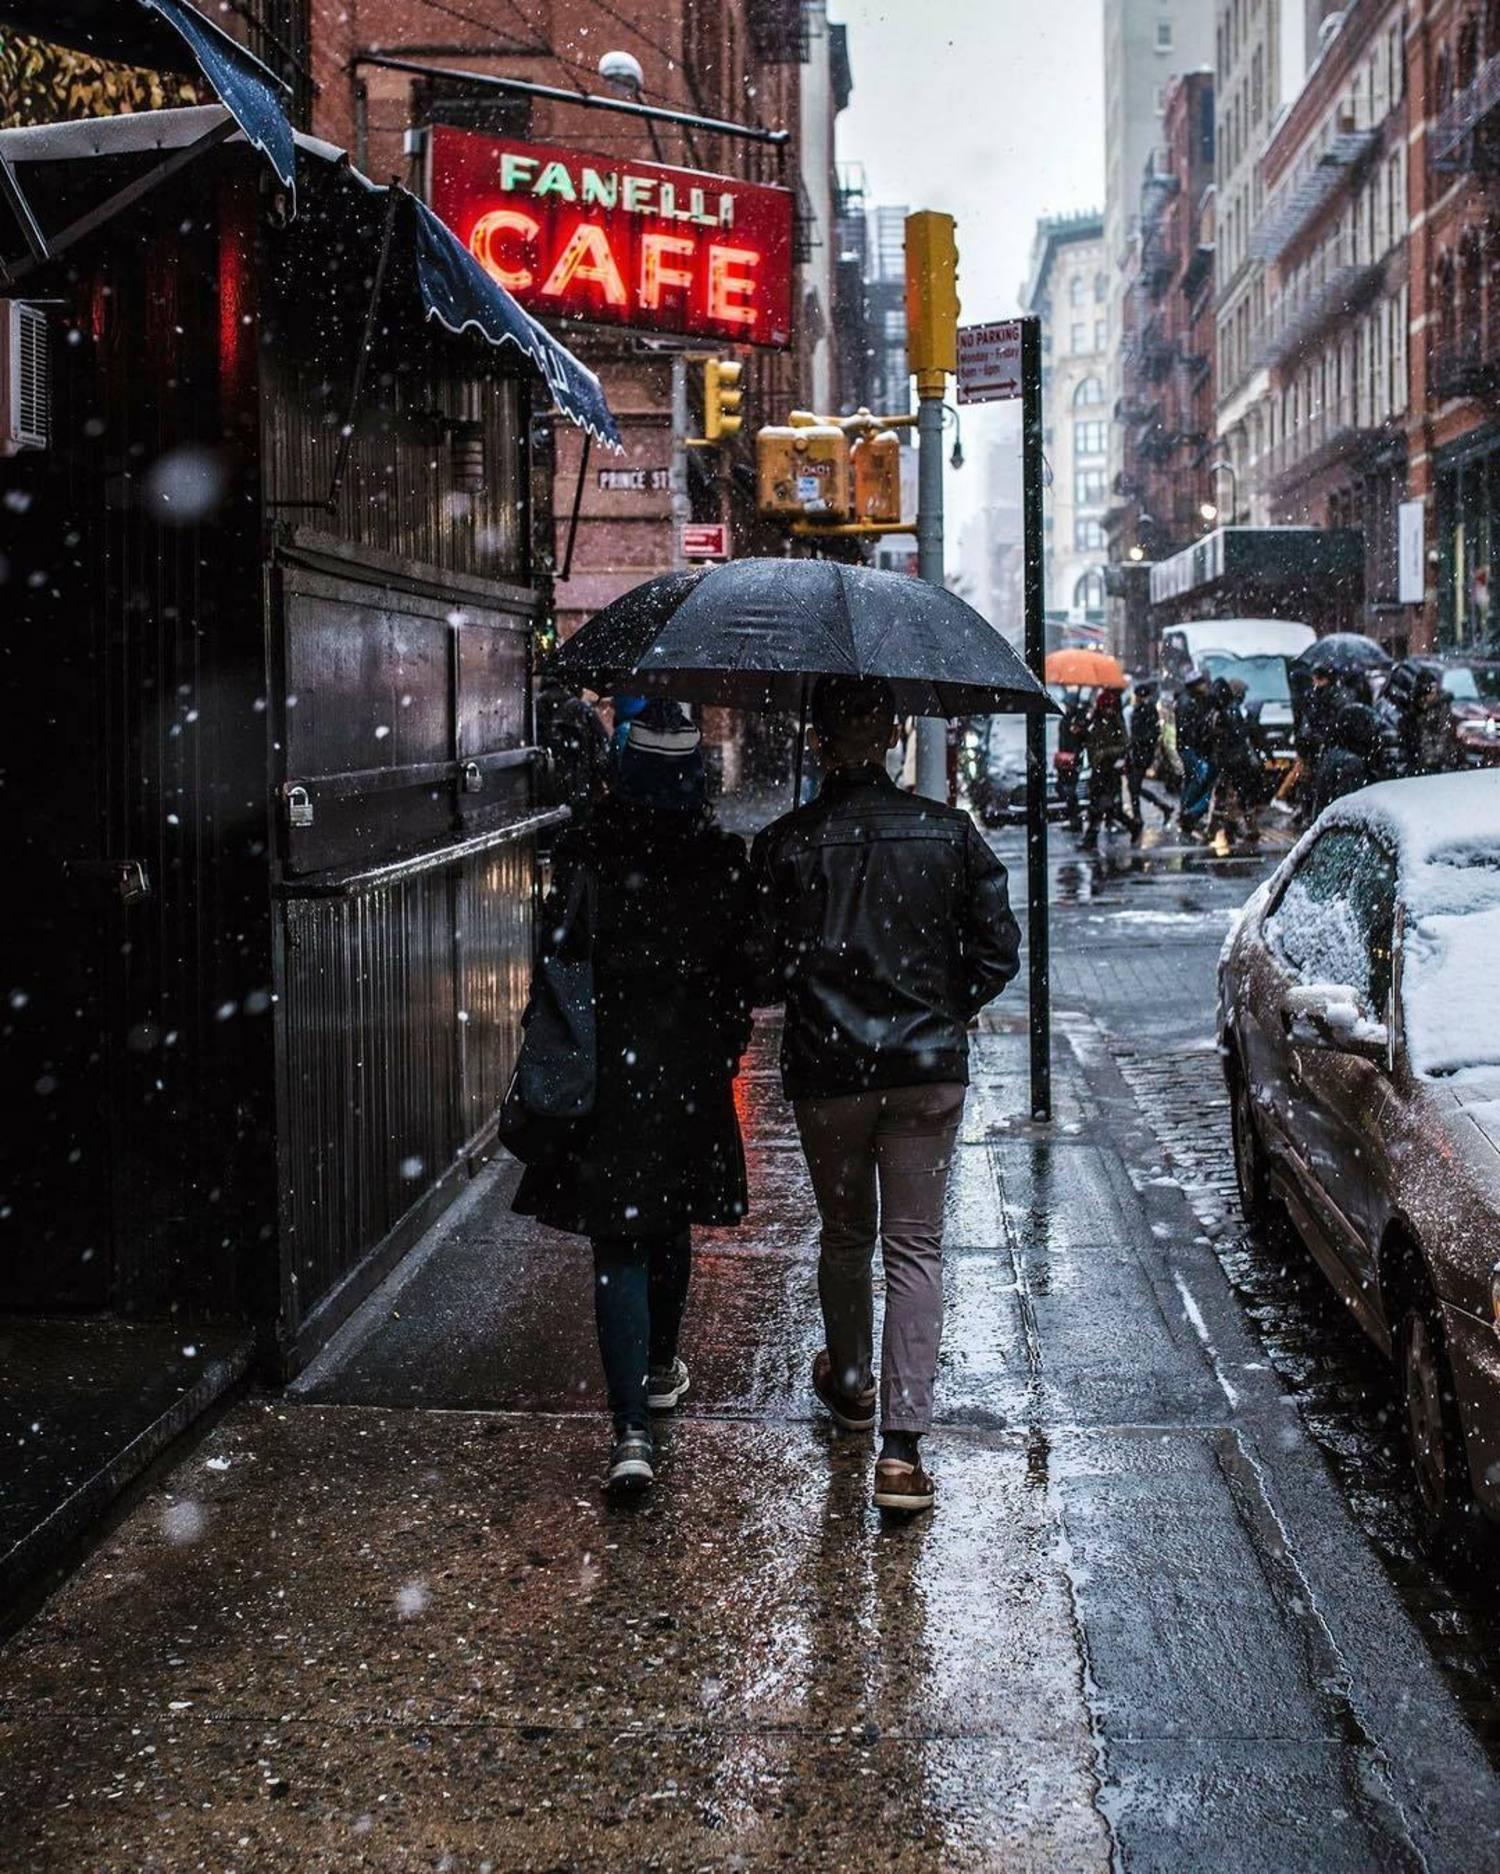 Fanelli Cafe, SoHo, New York, New York.